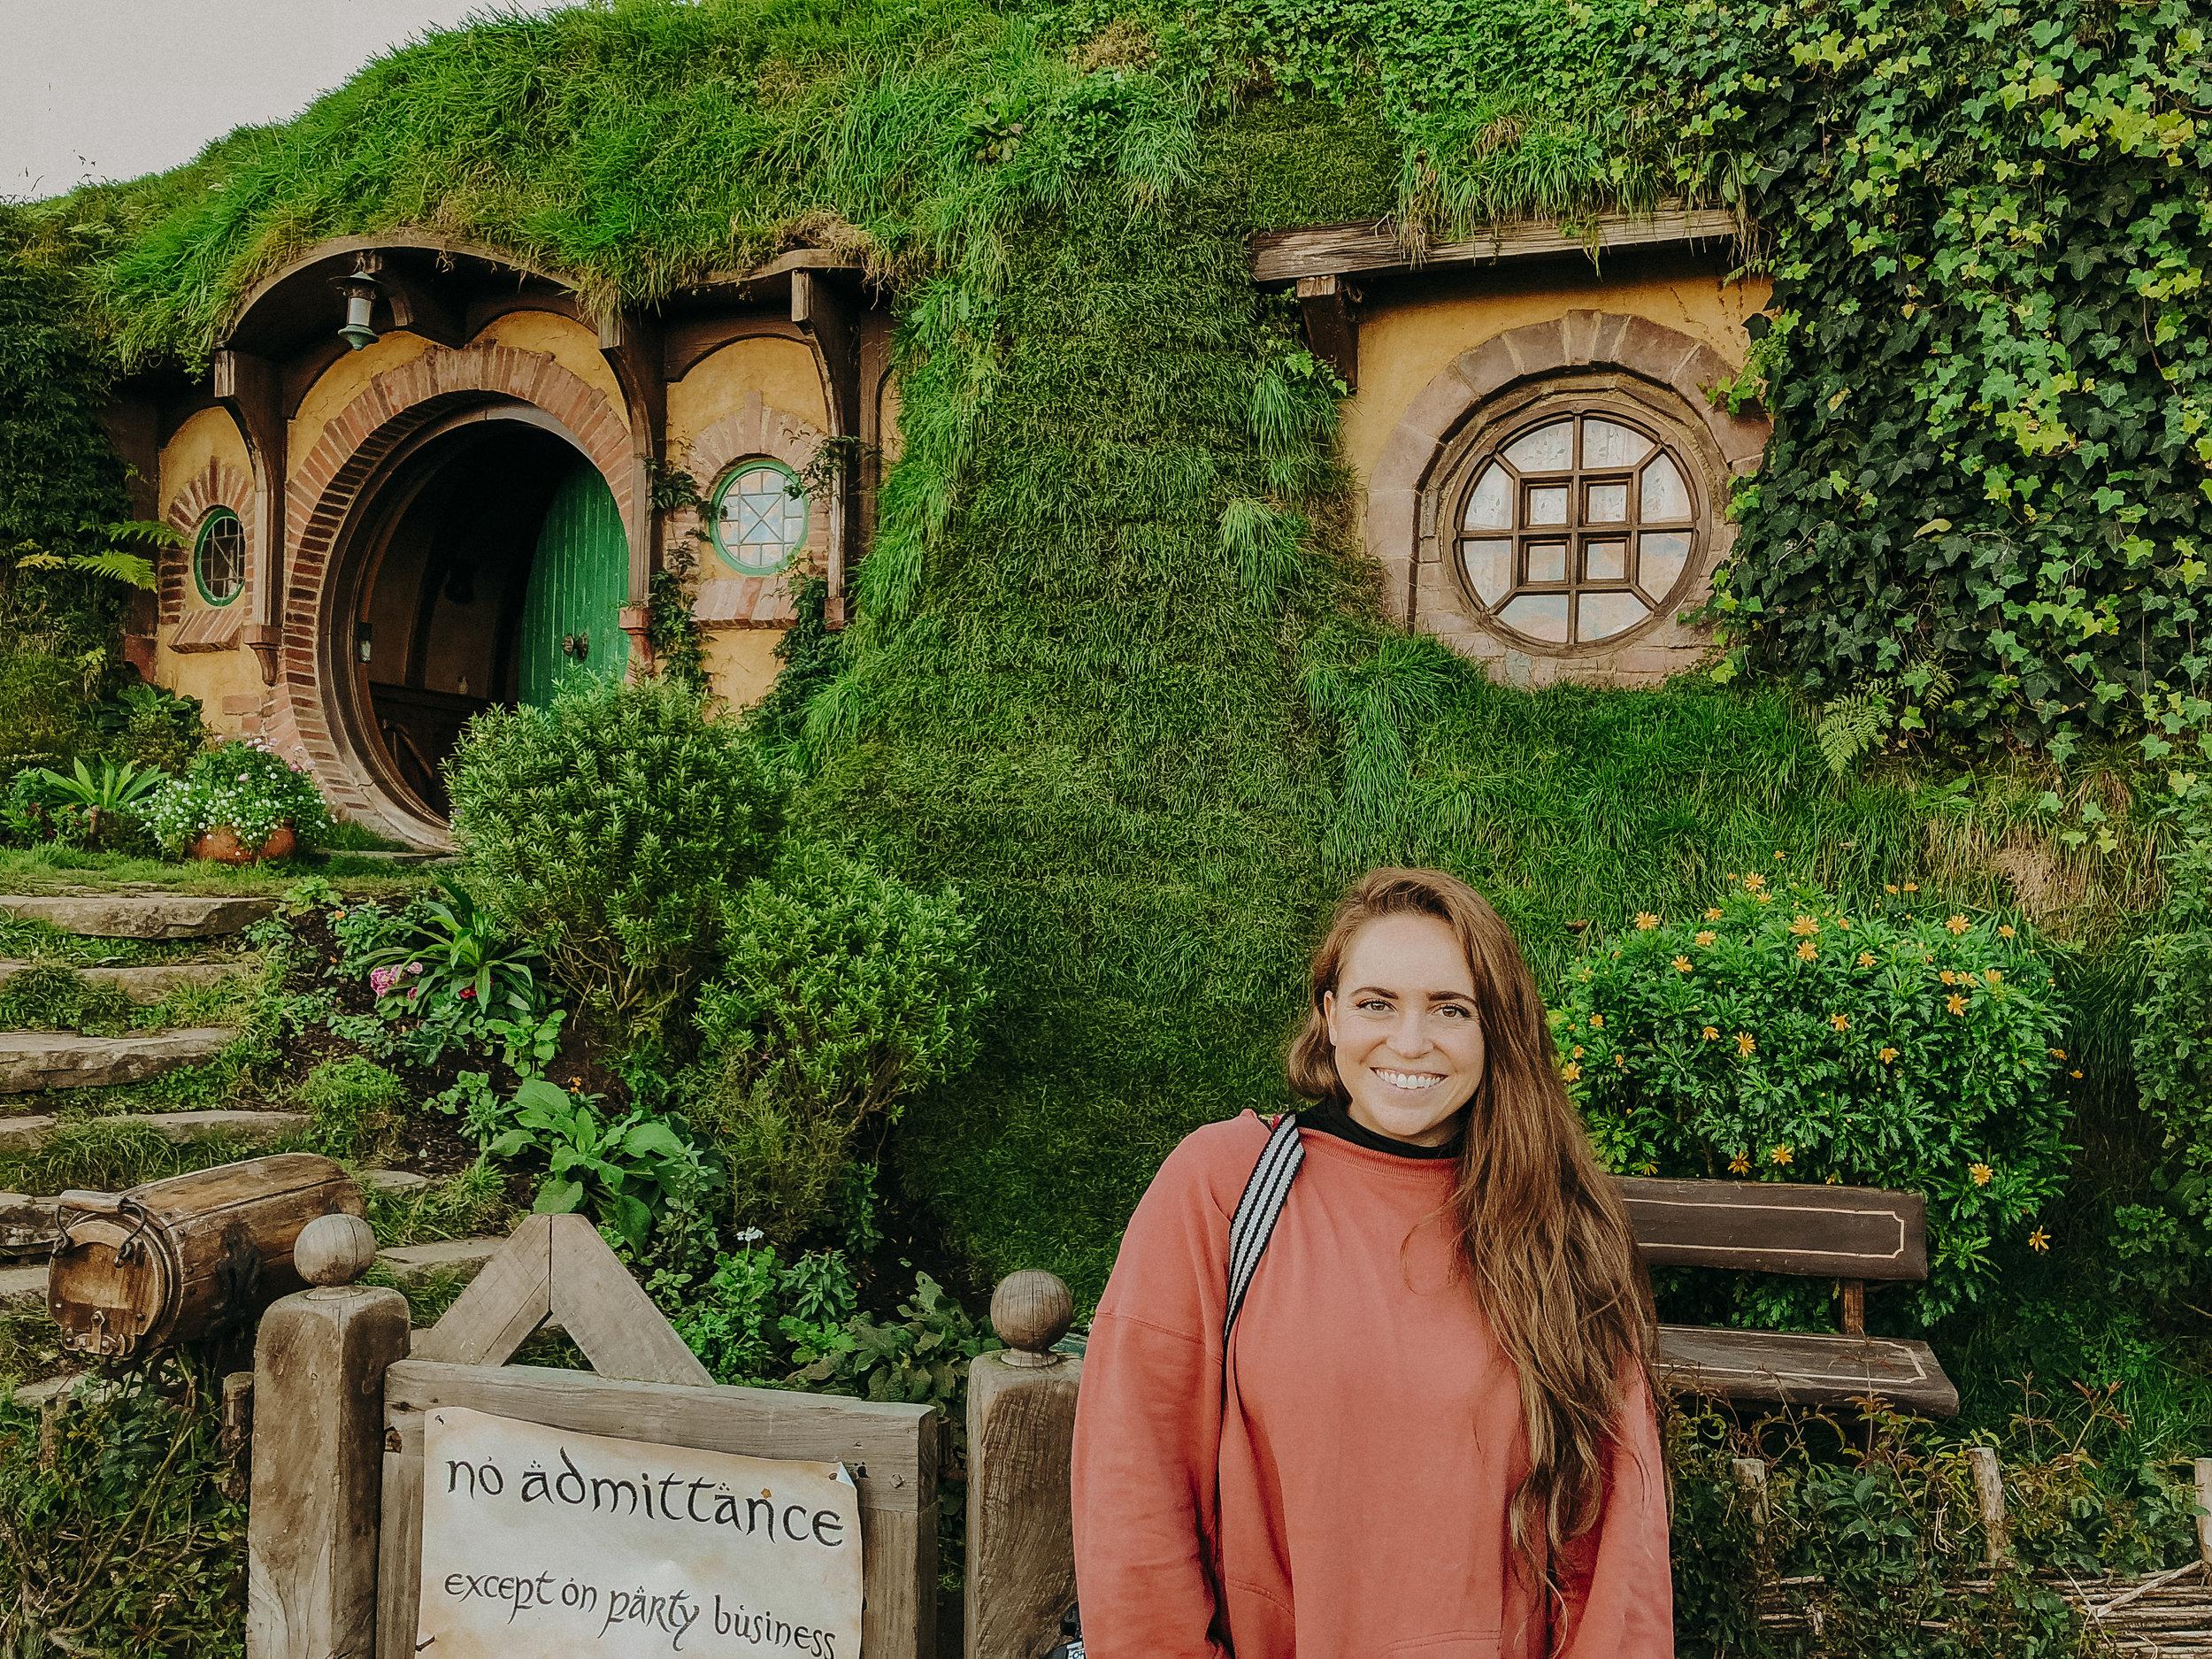 visit-hobbiton-things-to-do-new-zealand-25.jpg